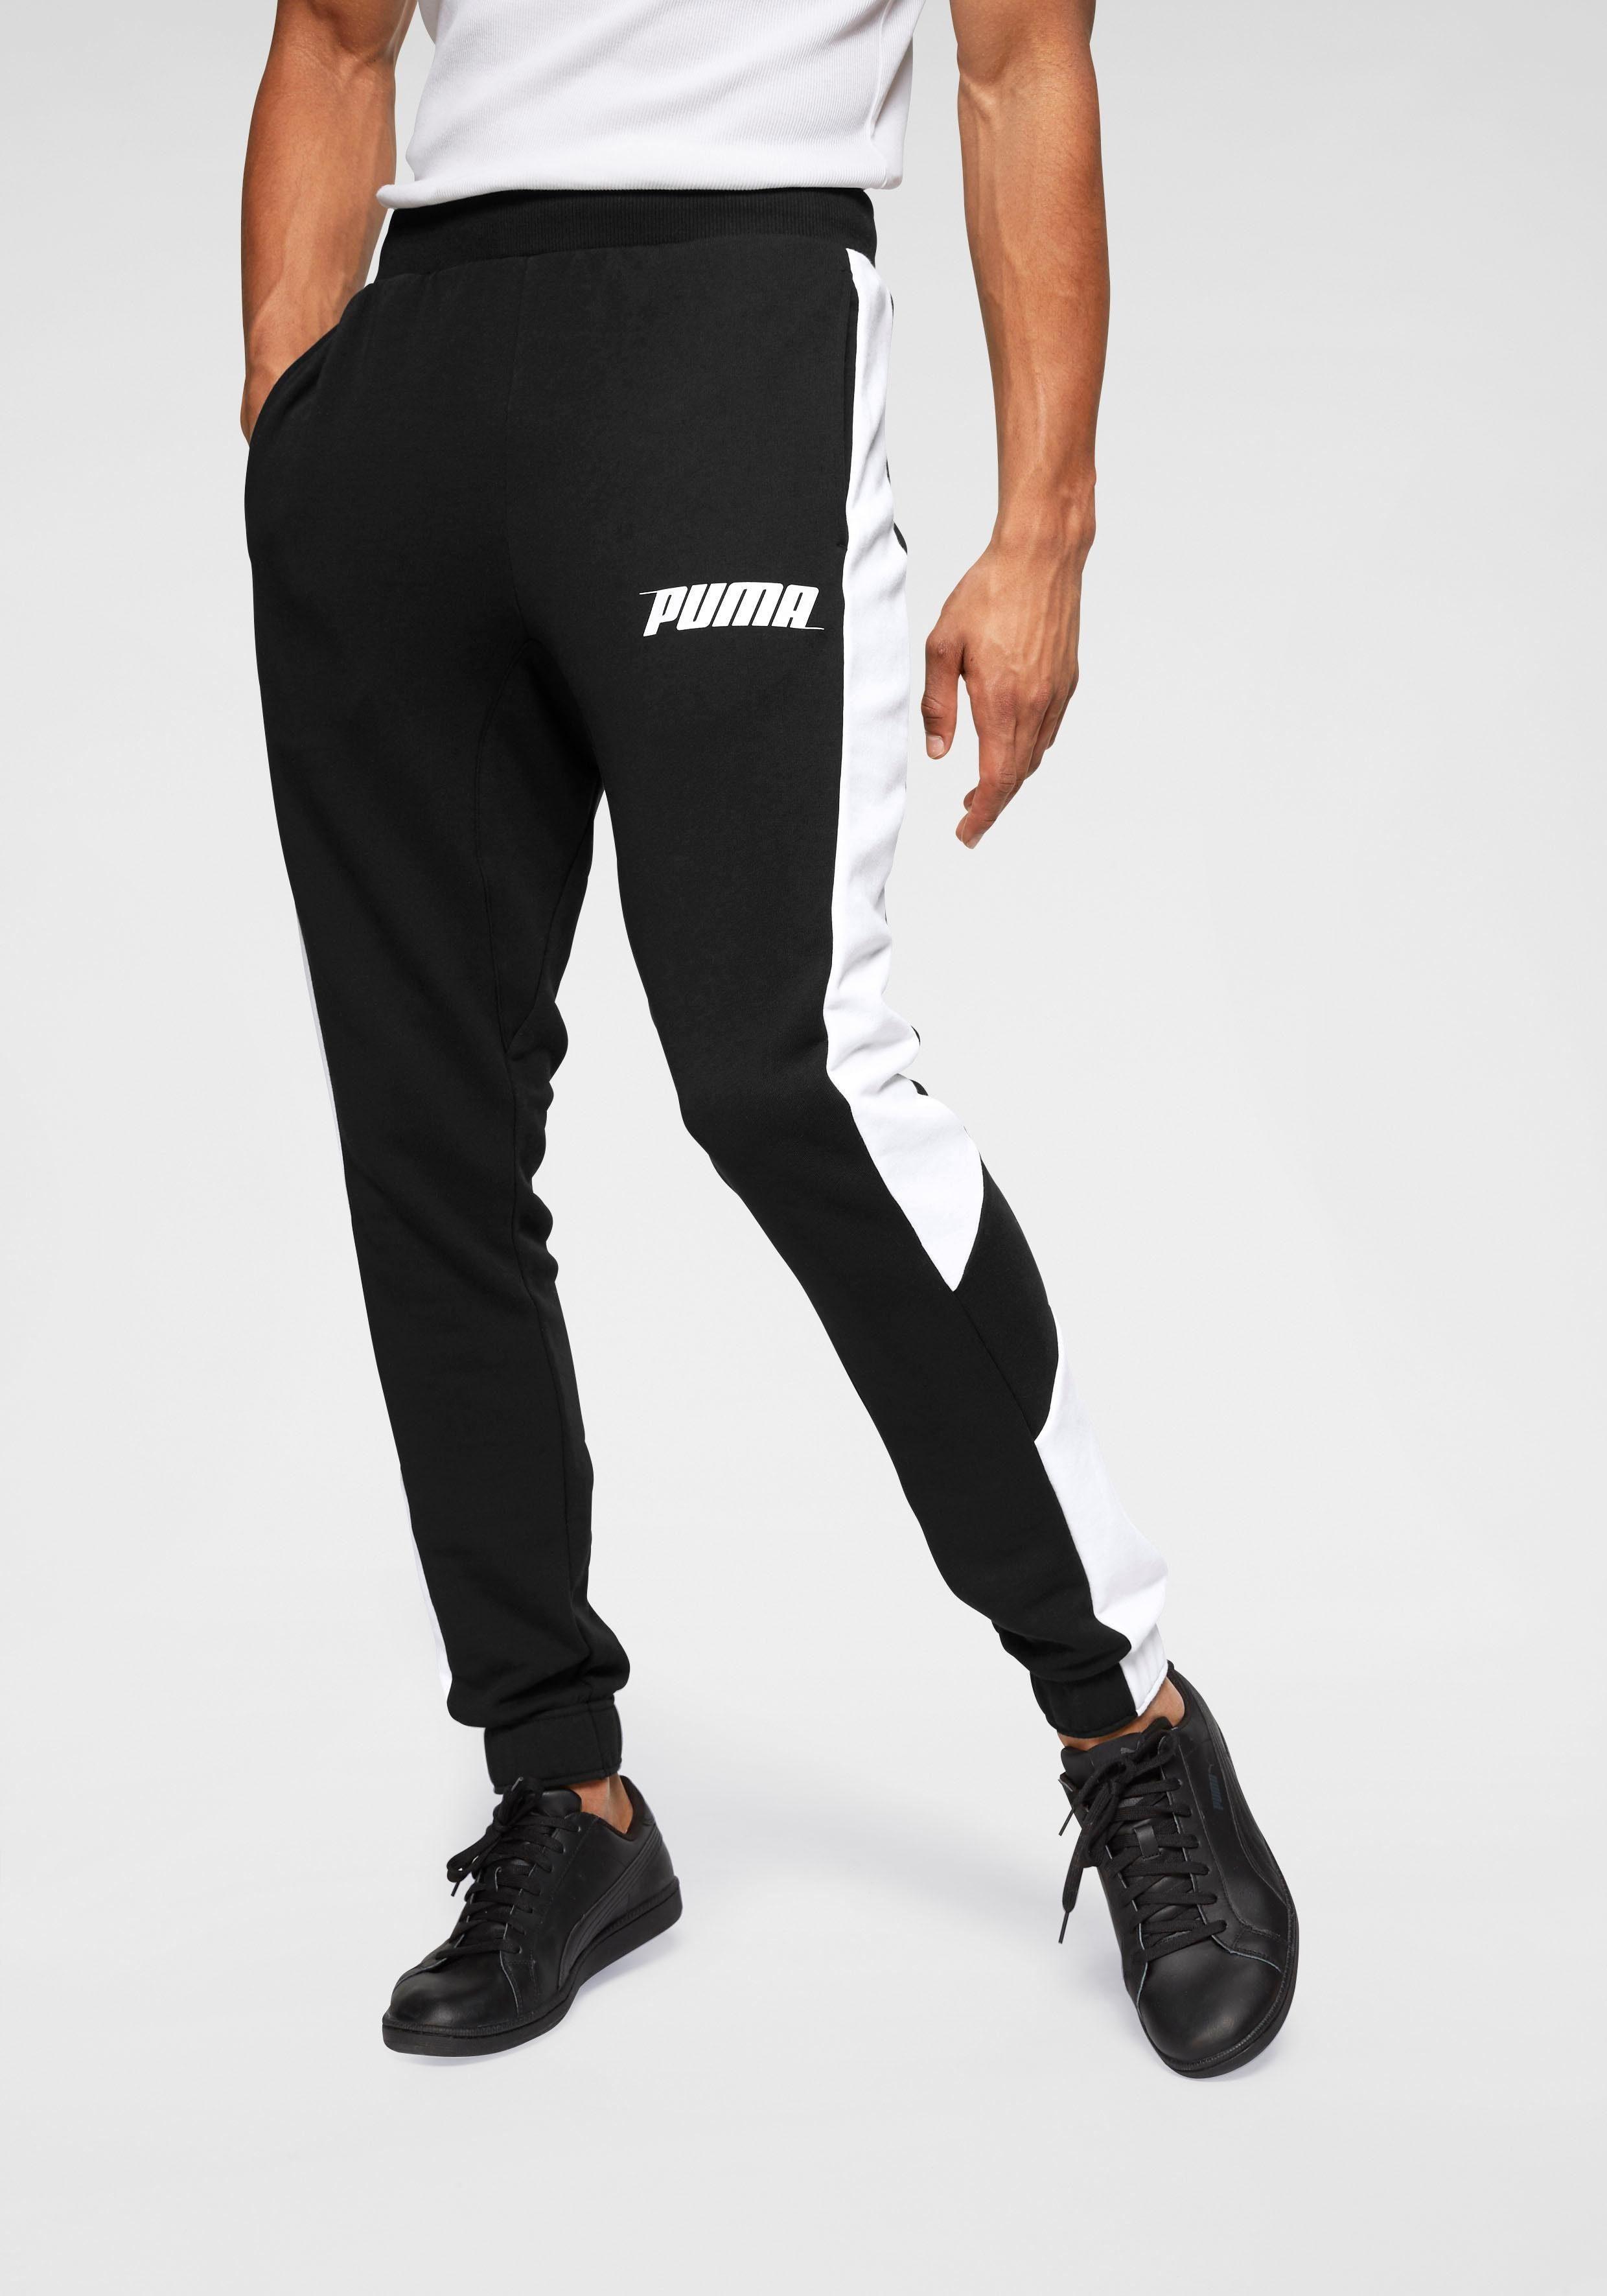 PUMA Jogginghose »REBEL PANTS TR CL«, Logodruck online kaufen | OTTO